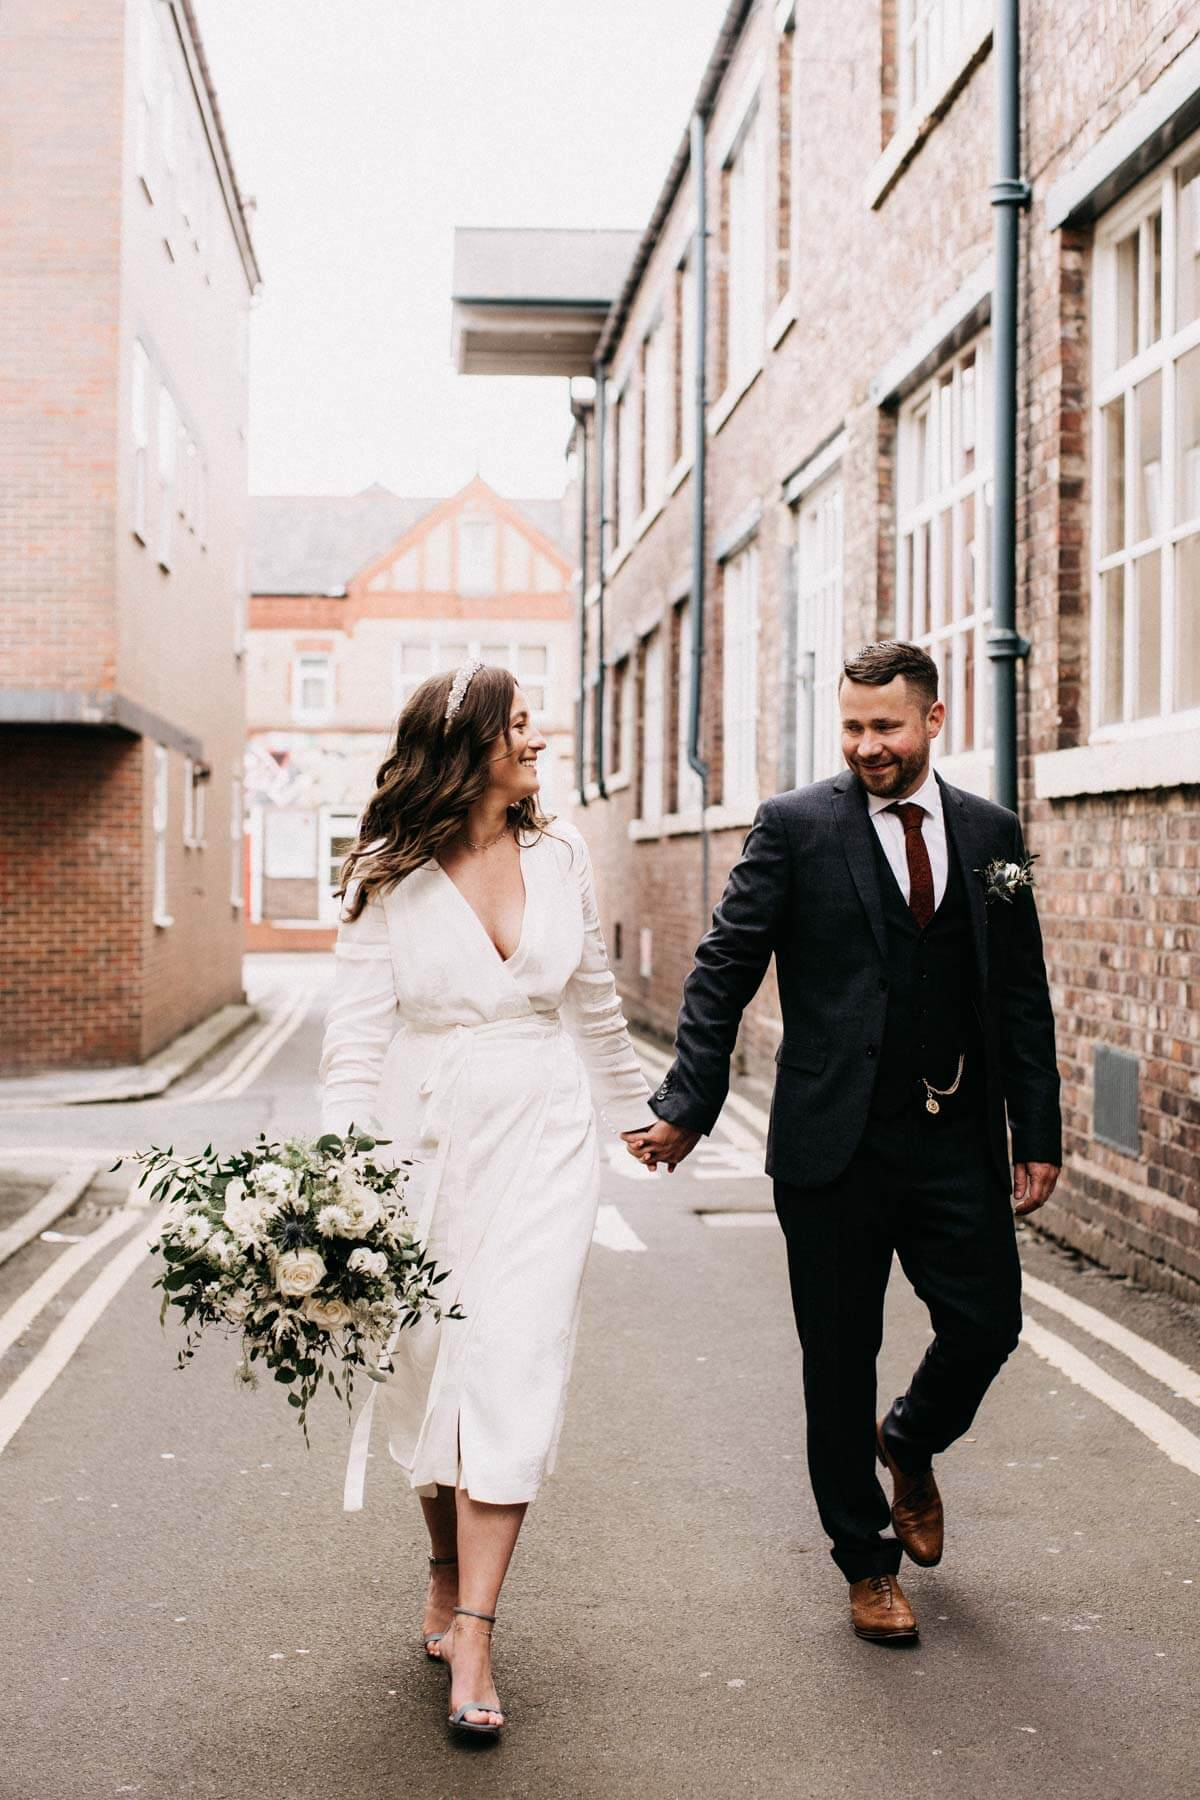 Wedding couple walking down Cheshire street